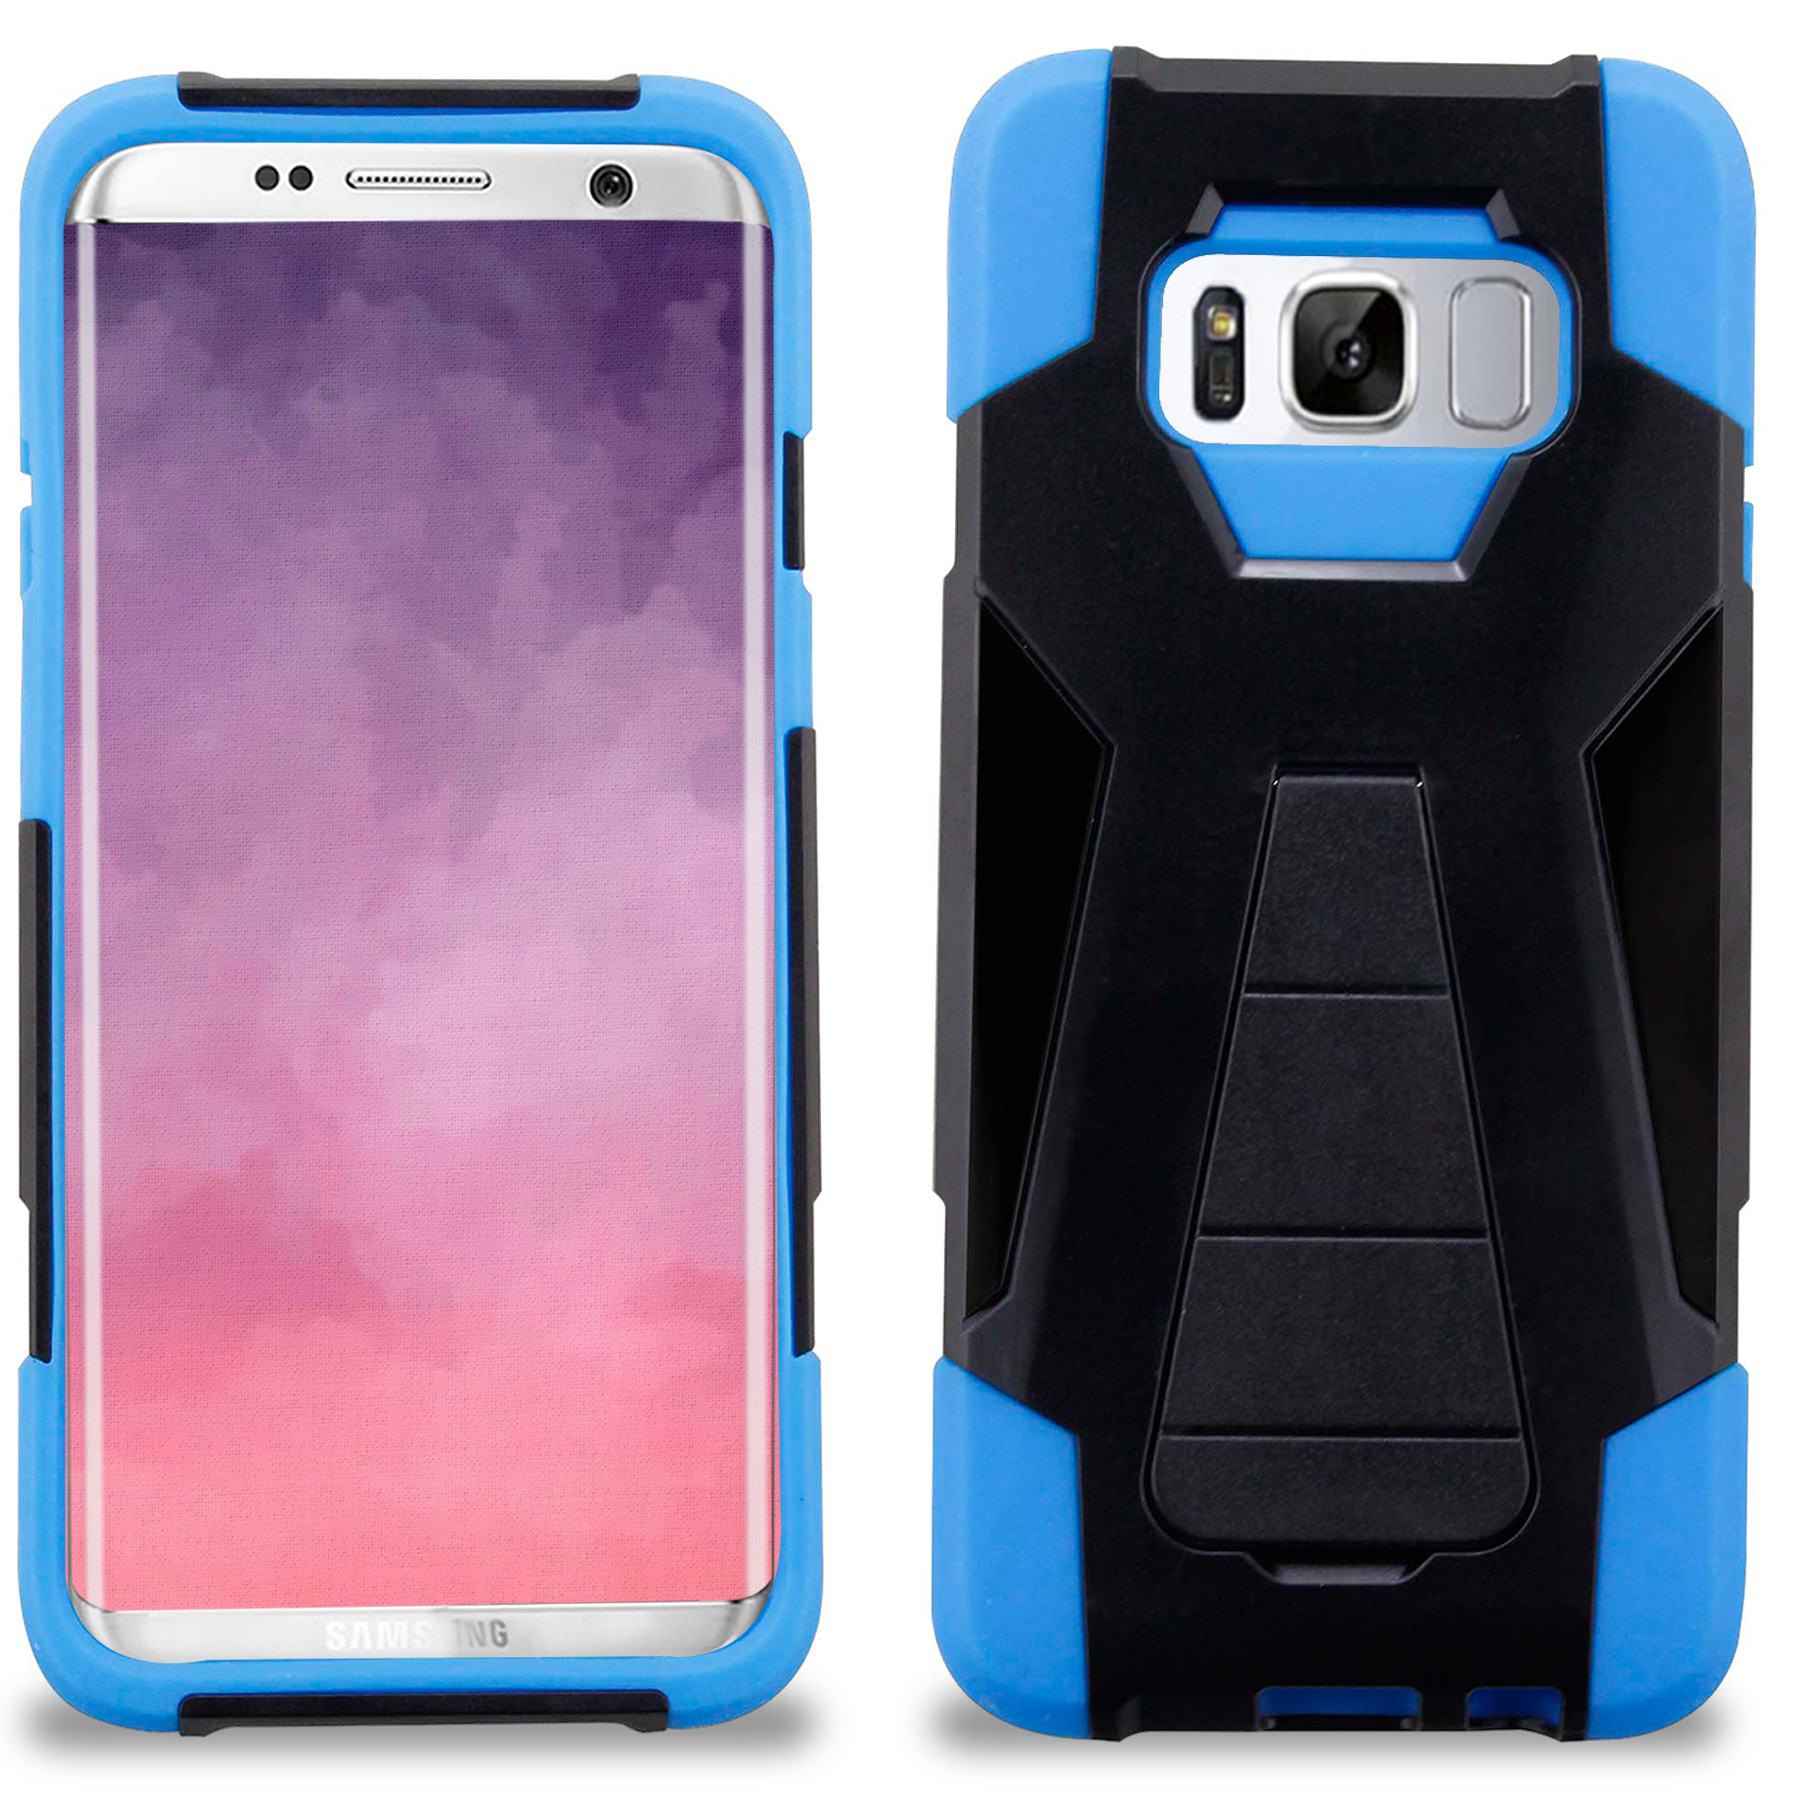 Samsung Galaxy S8 / S8 Plus Case, Zizo Dual Layer - Slim Fit Case w/ Kickstand